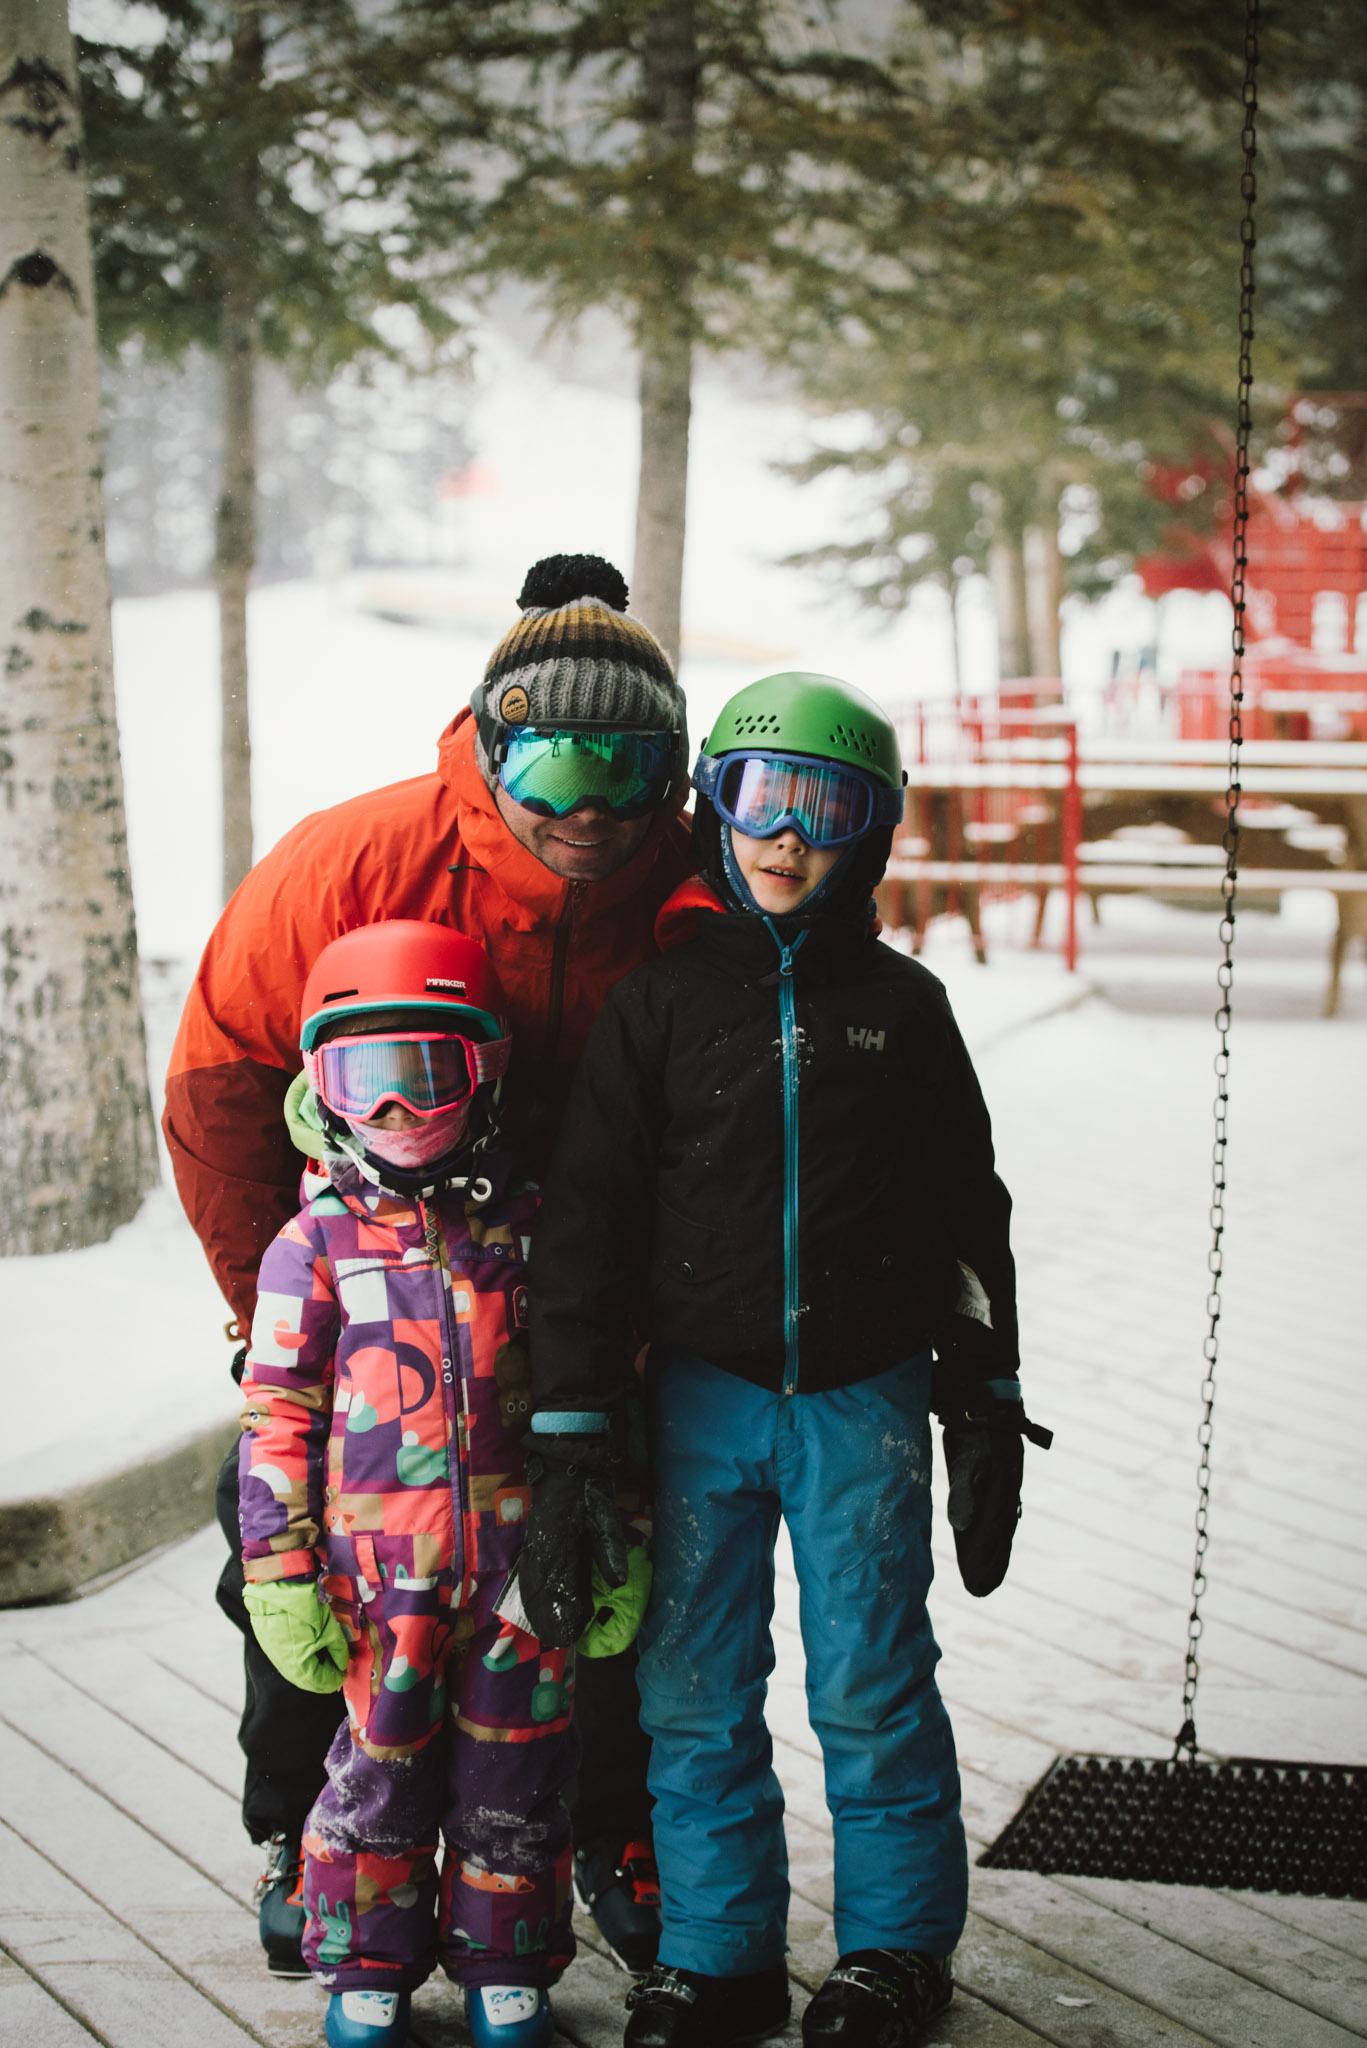 Chelsea Czibere - January 19, 2018 - Nakiska Ski Resort-39.jpg